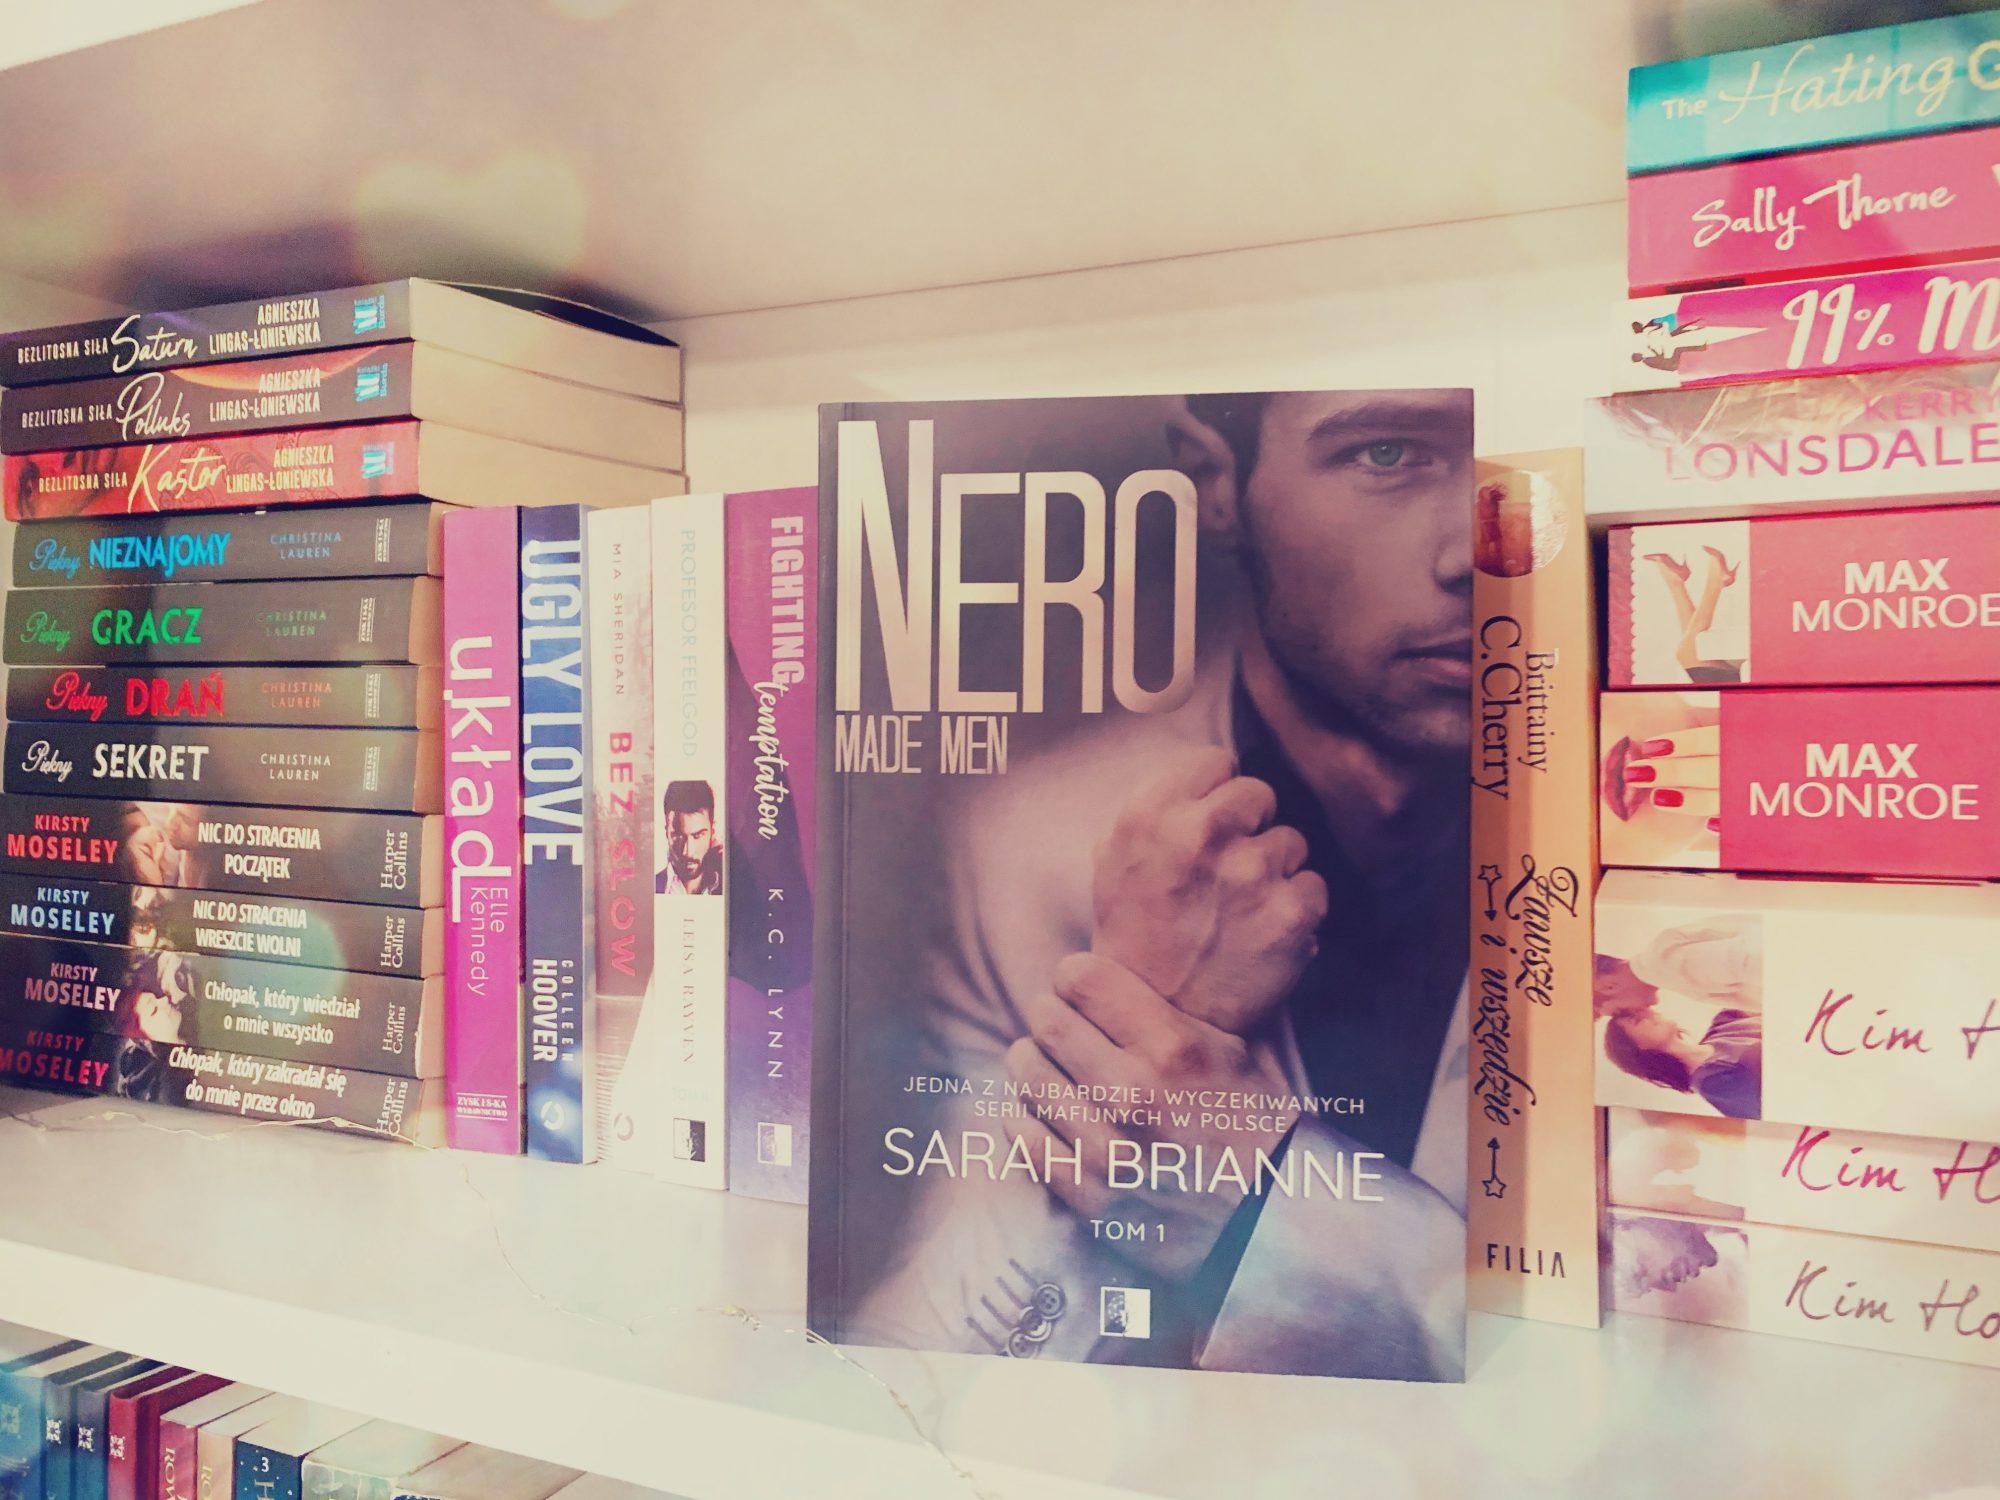 Nero - Sarah Brianne